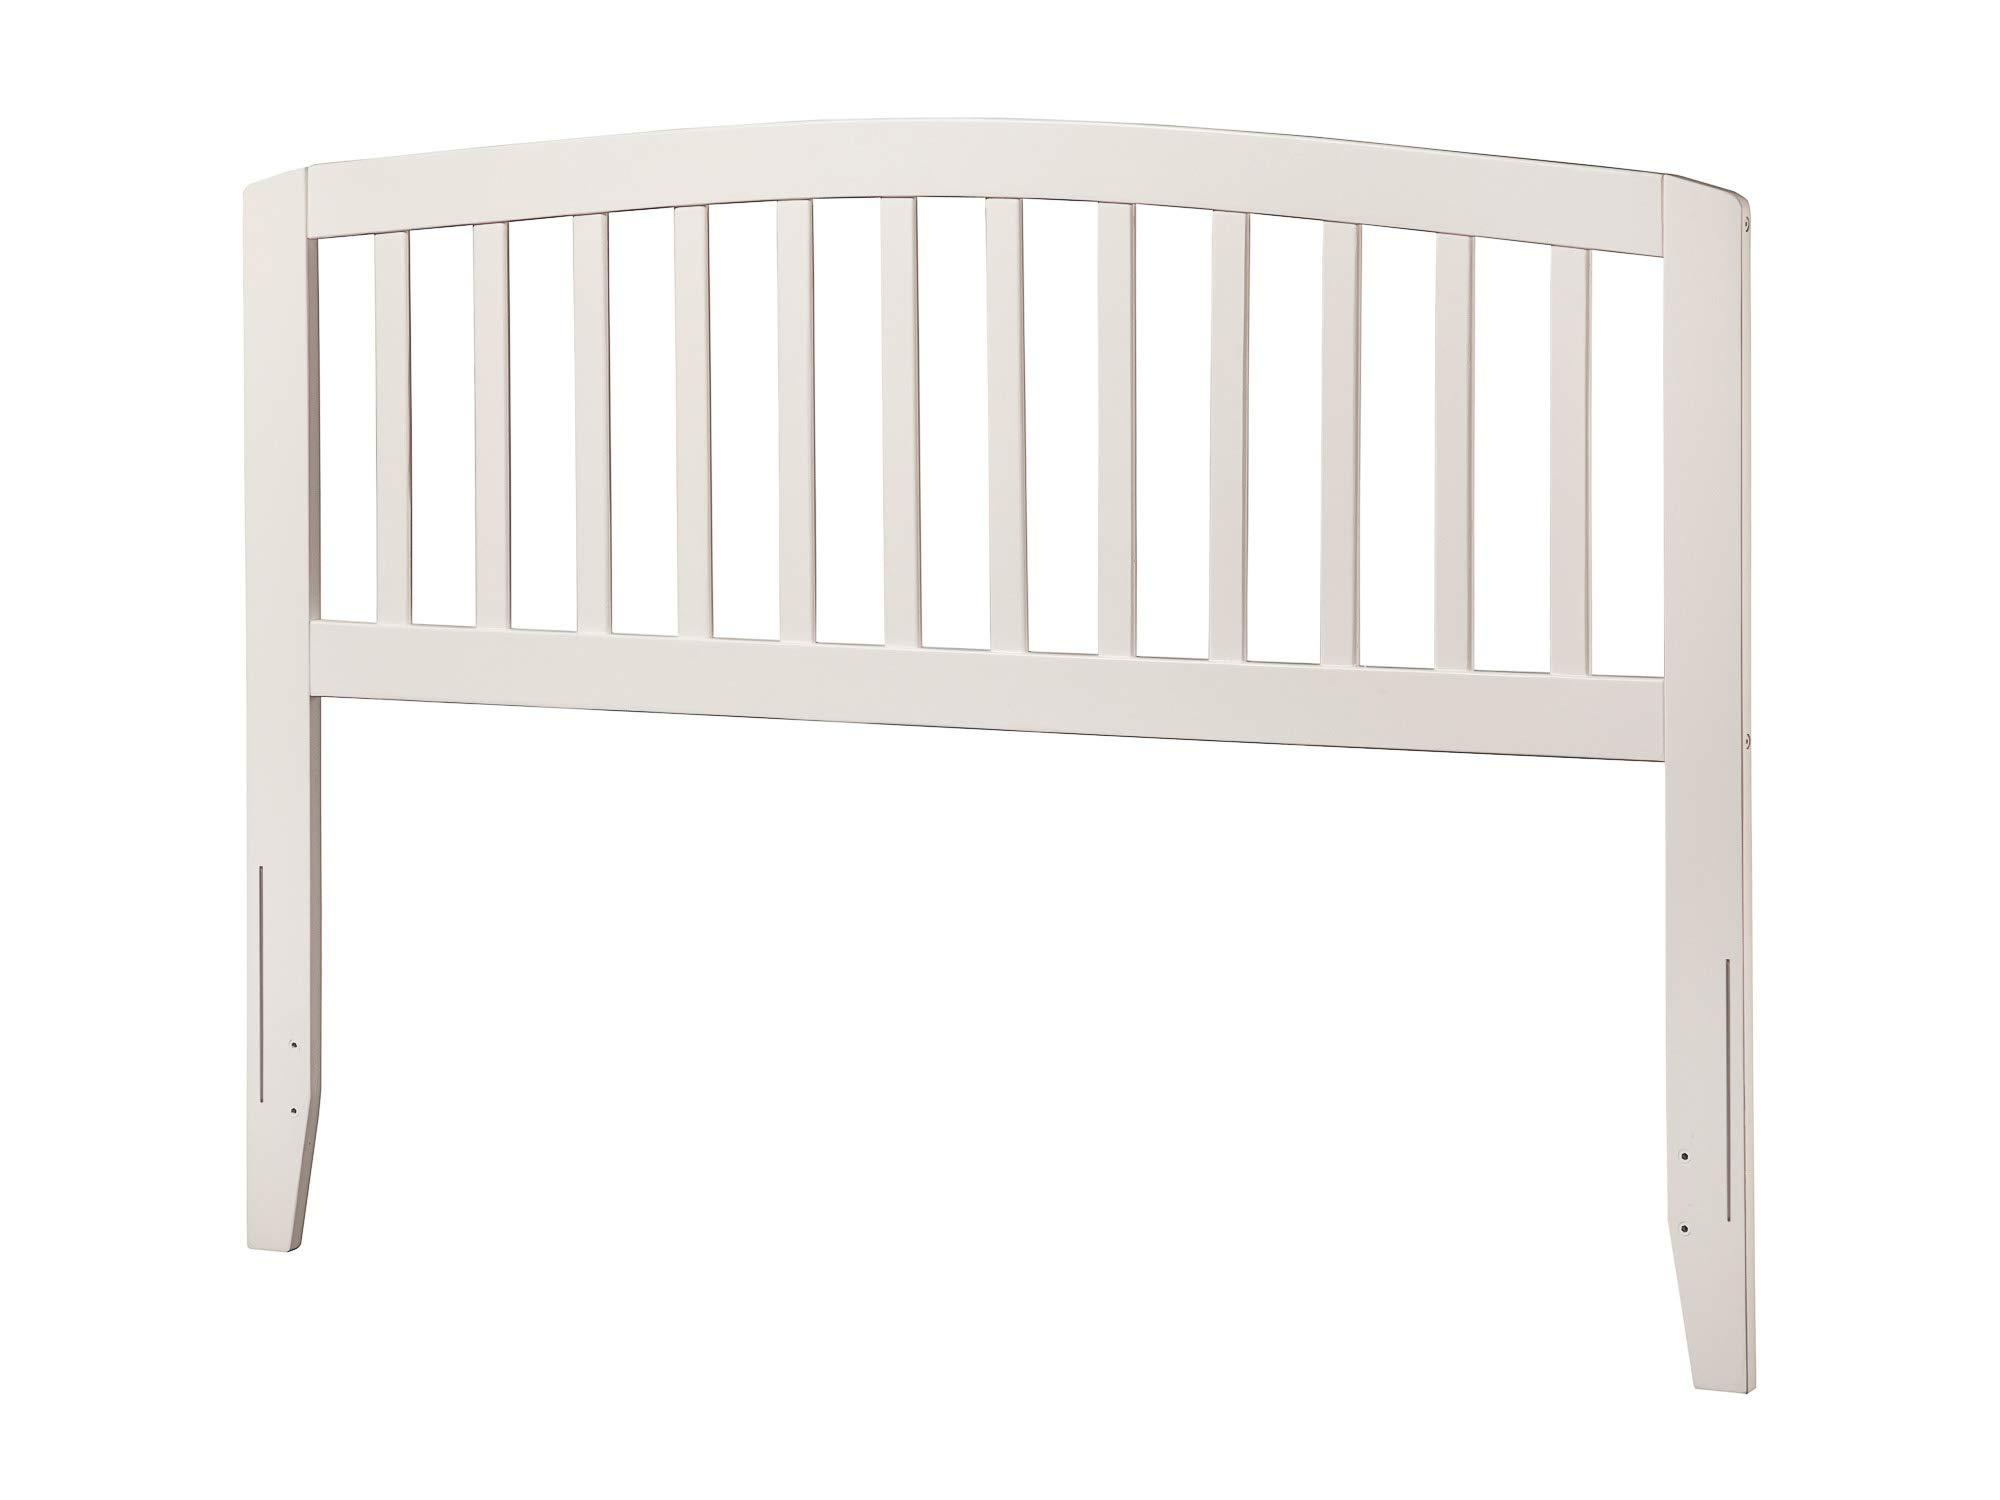 Atlantic Furniture AR288832 Richmond Headboard, Full, White